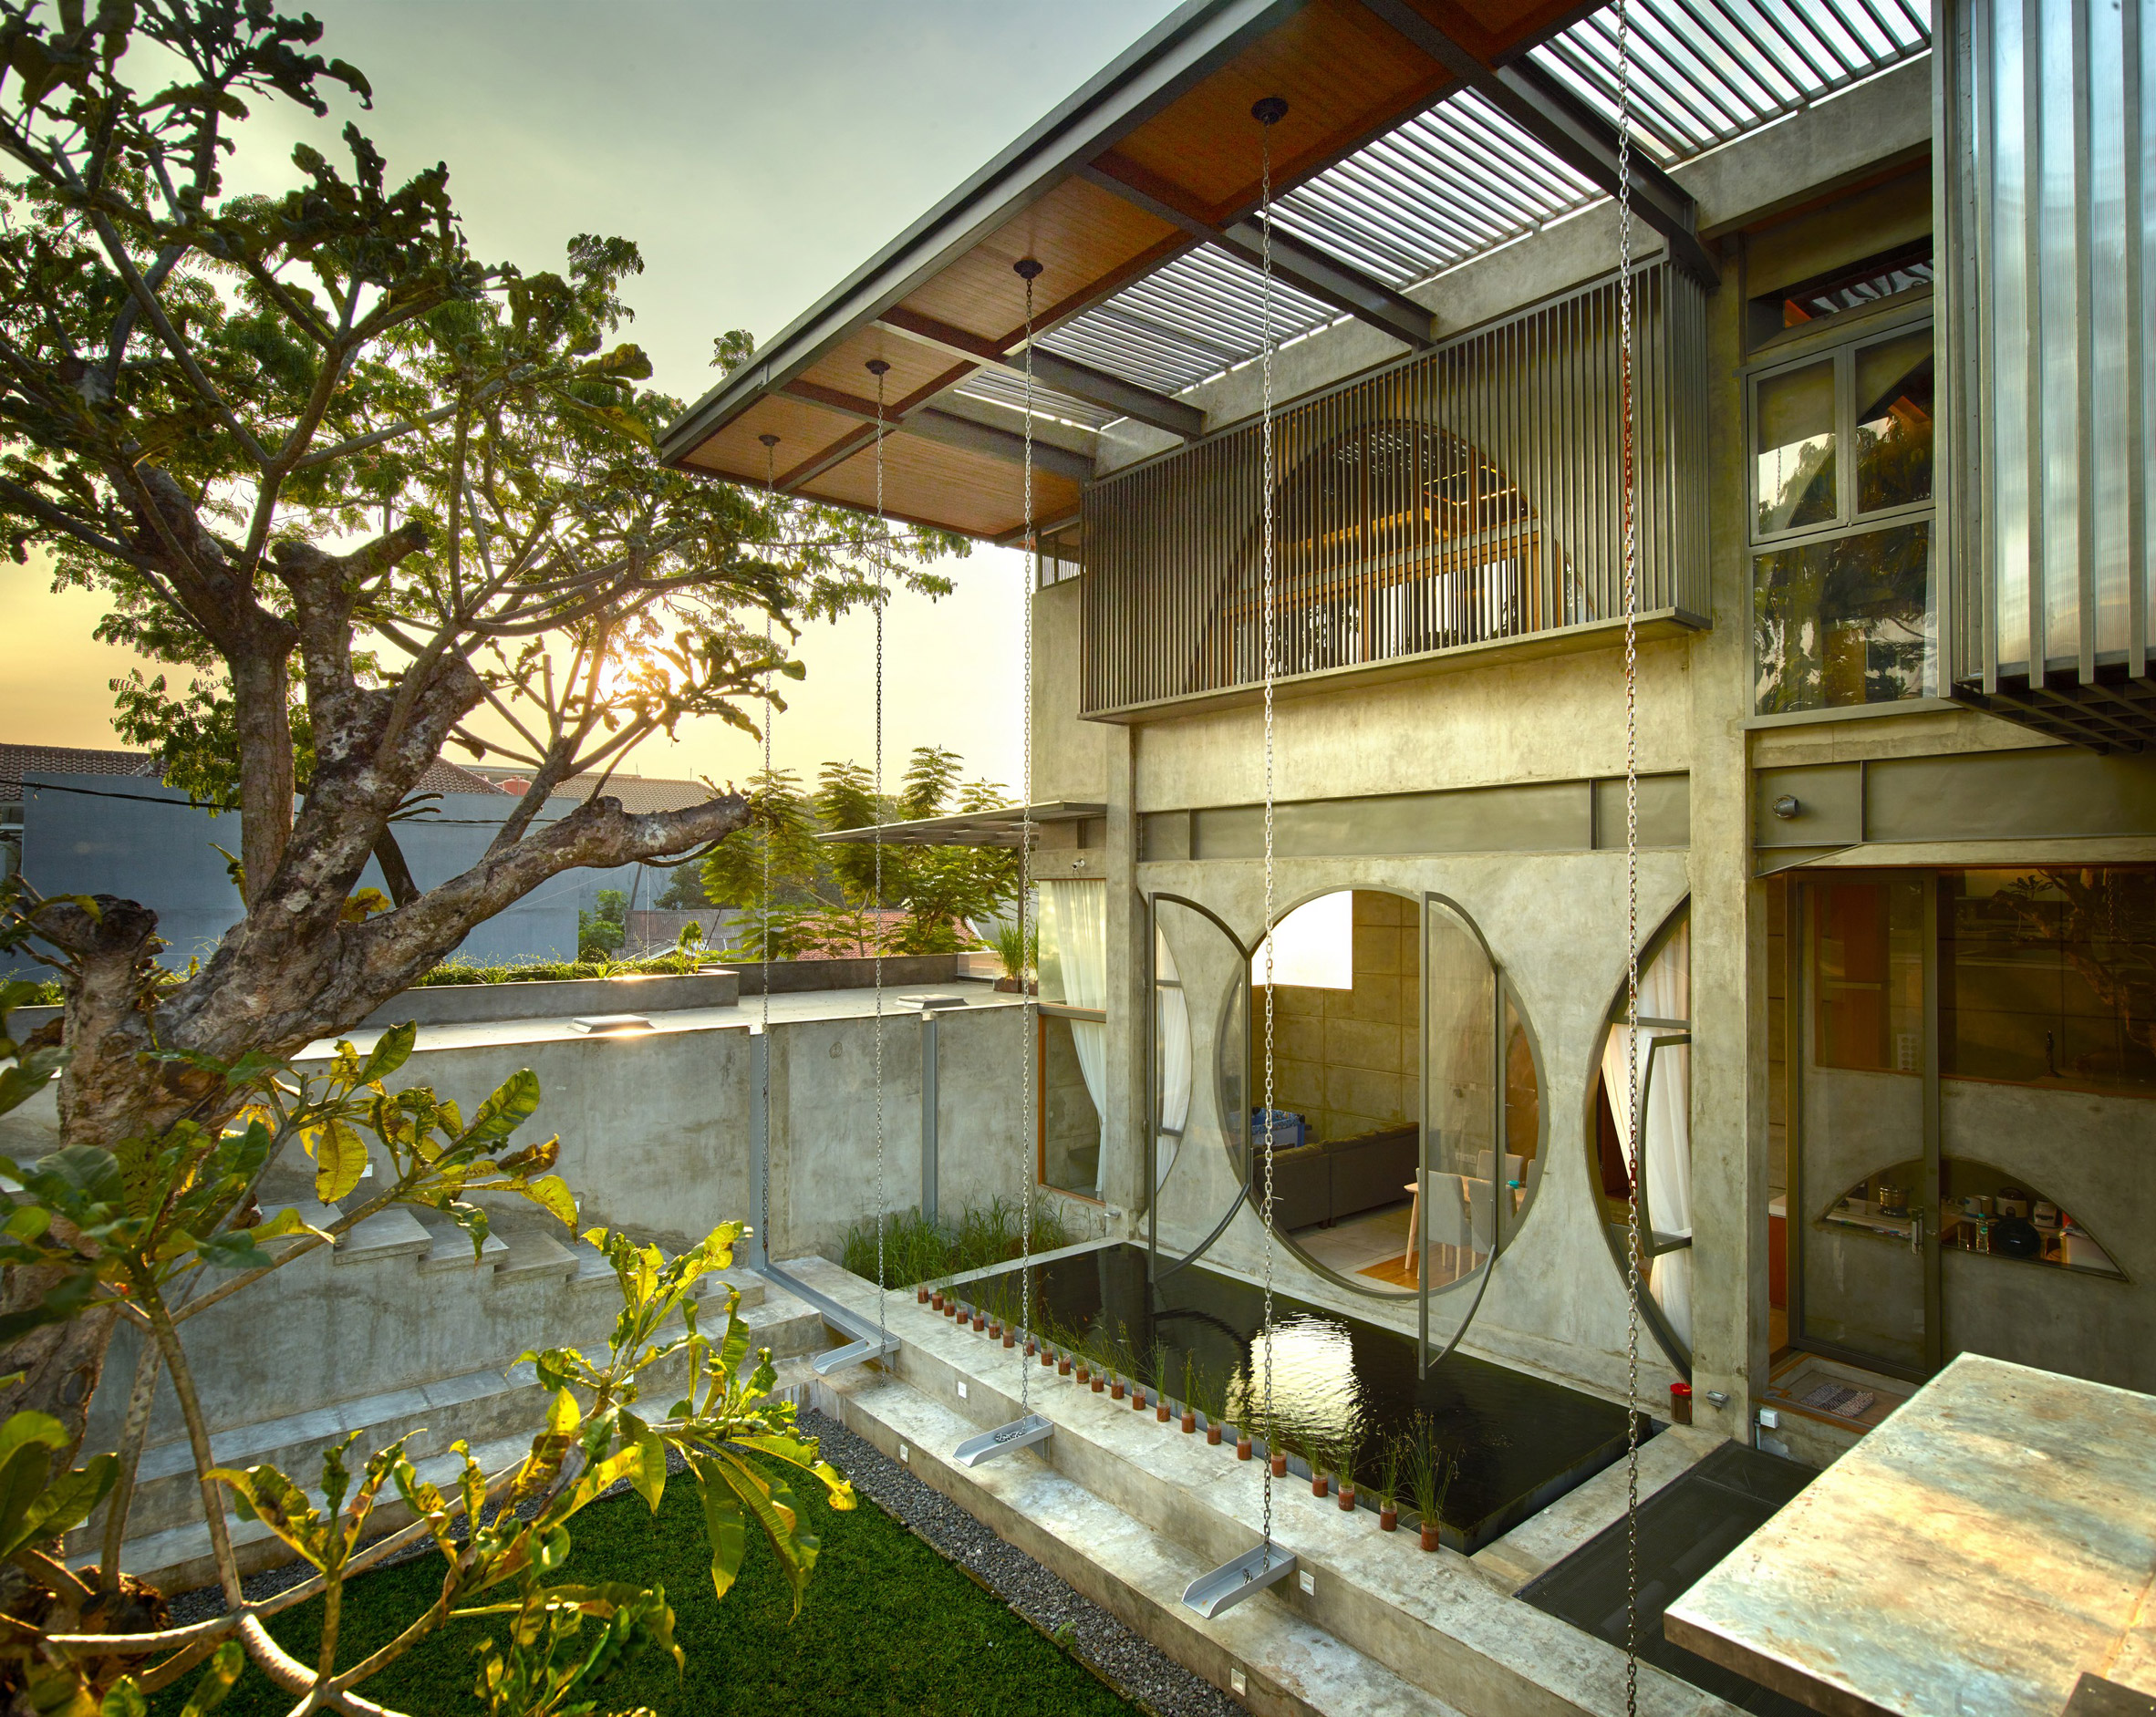 Circular windows and pyramidal skylights add playful geometry to Indonesian home